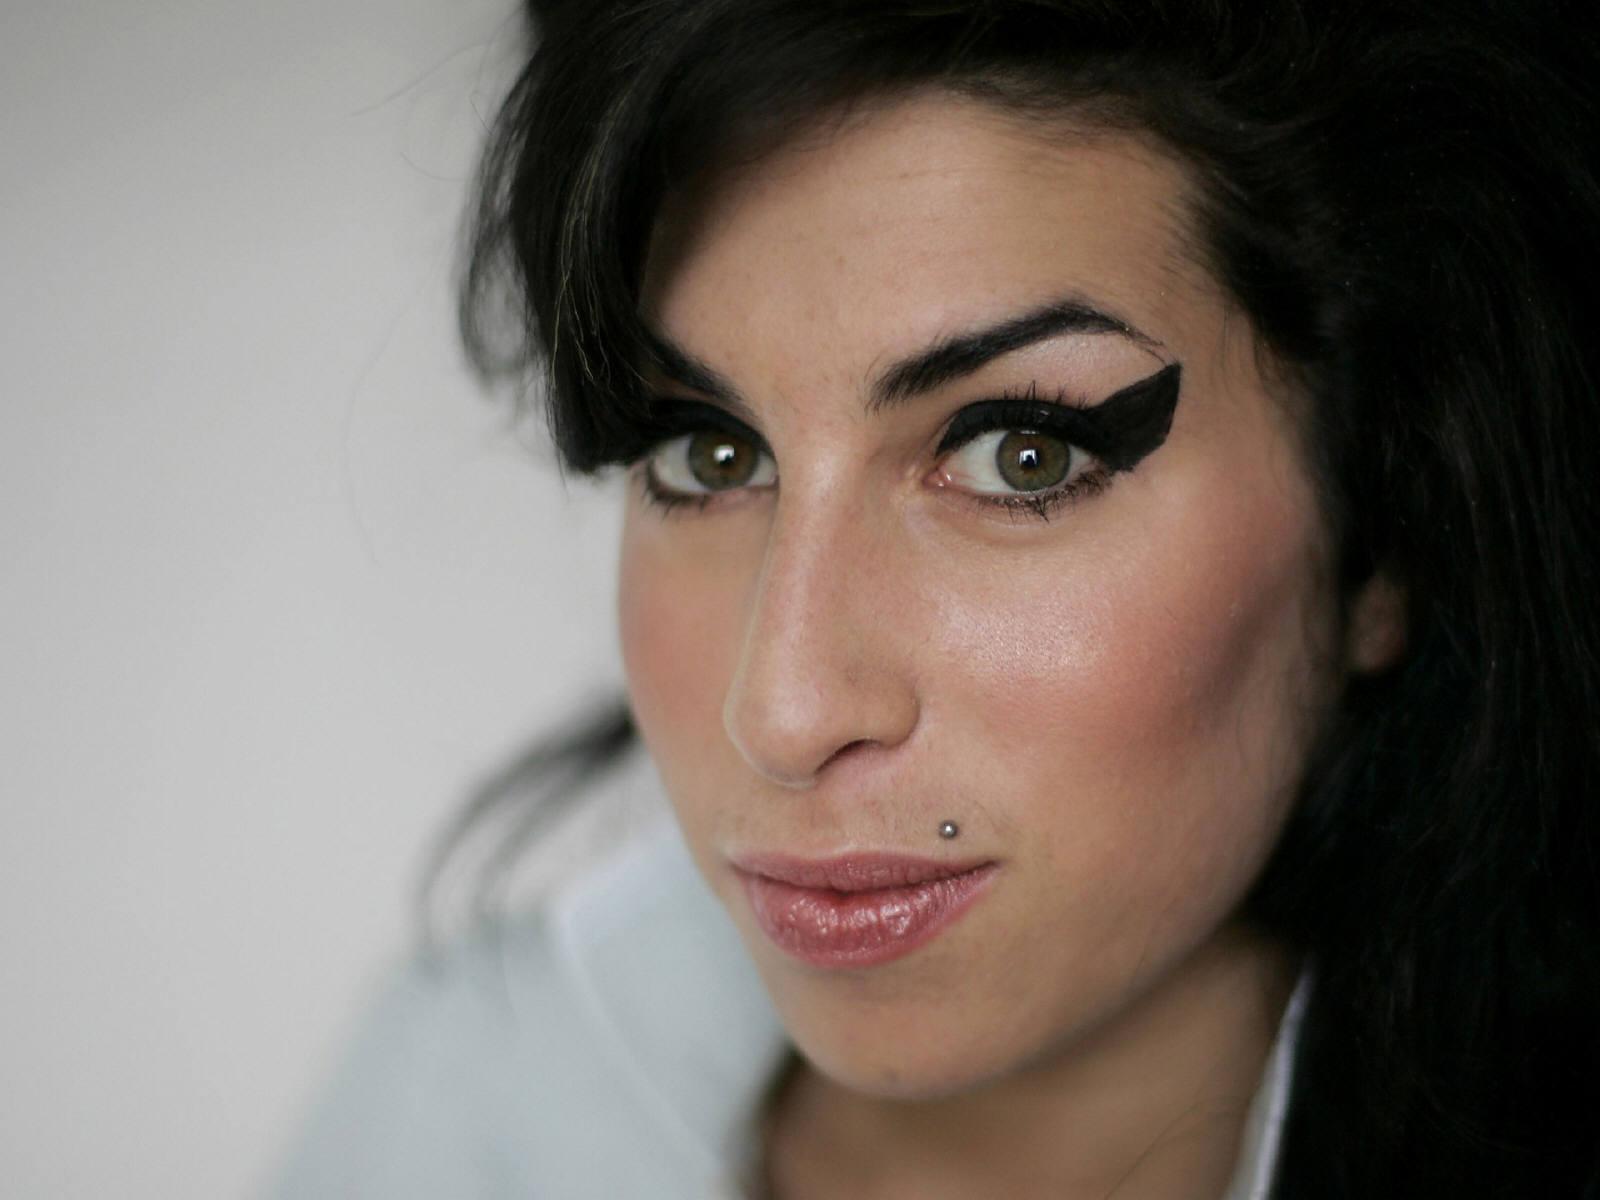 http://3.bp.blogspot.com/-AH3OtDkHRZg/TkV1JwUVrTI/AAAAAAAAAT8/FhNKPJ9ZGbk/s1600/Amy_Winehouse_0004_1600X1200_Wallpaper.jpg